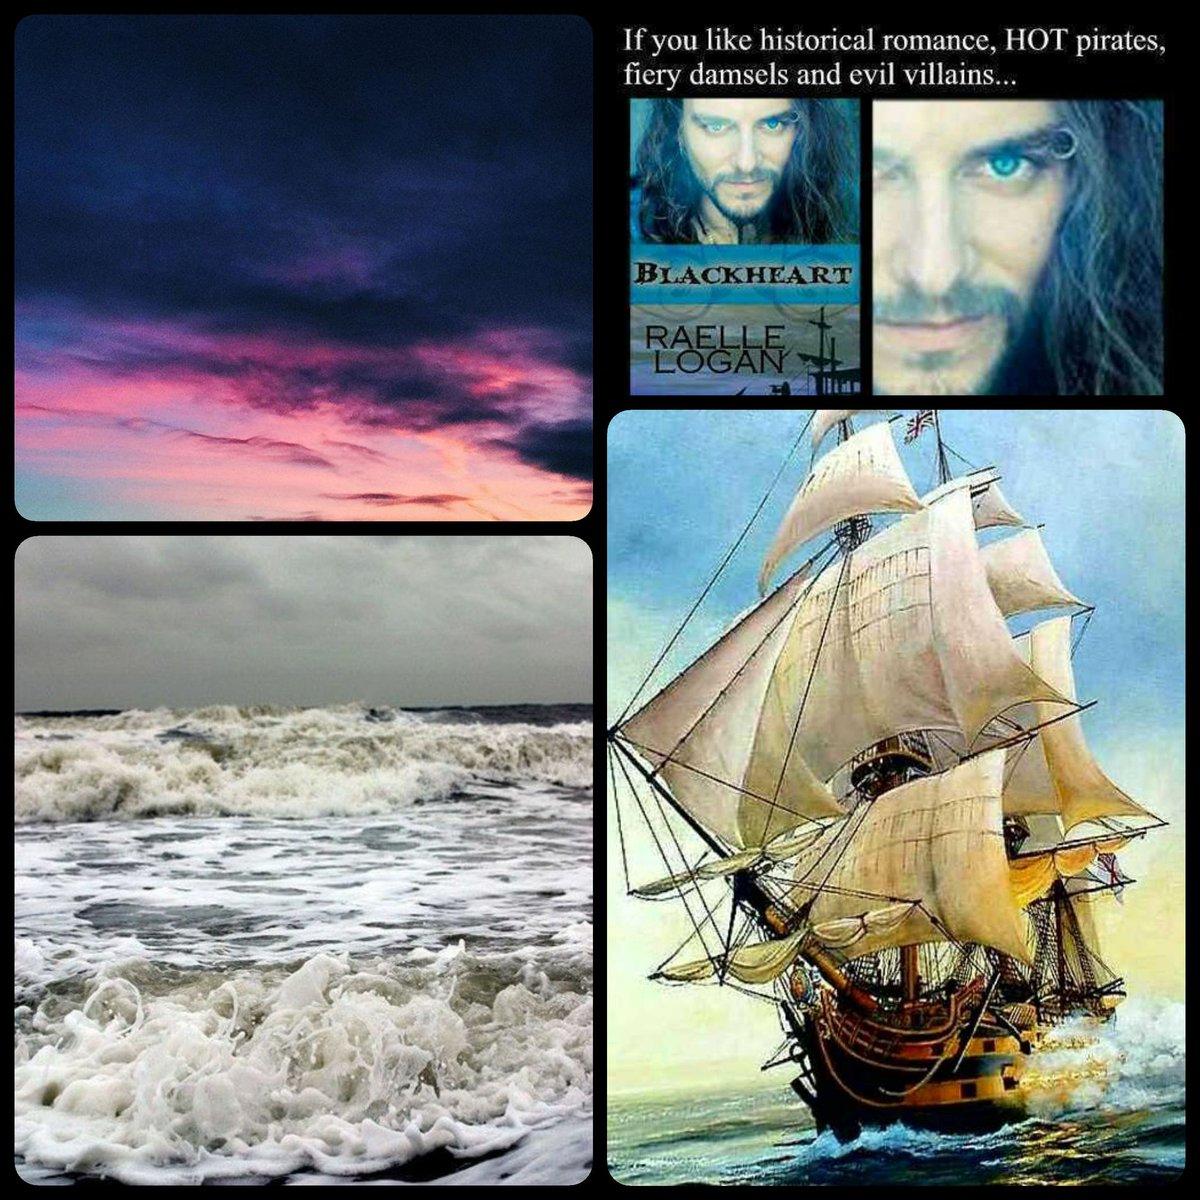 When the Waves get Rough, the Tough get Goin&#39;..#books #book #novel #vacation #storyteller #romance #coffee #gamedev #fantasy #historical<br>http://pic.twitter.com/klbBjXJb2G